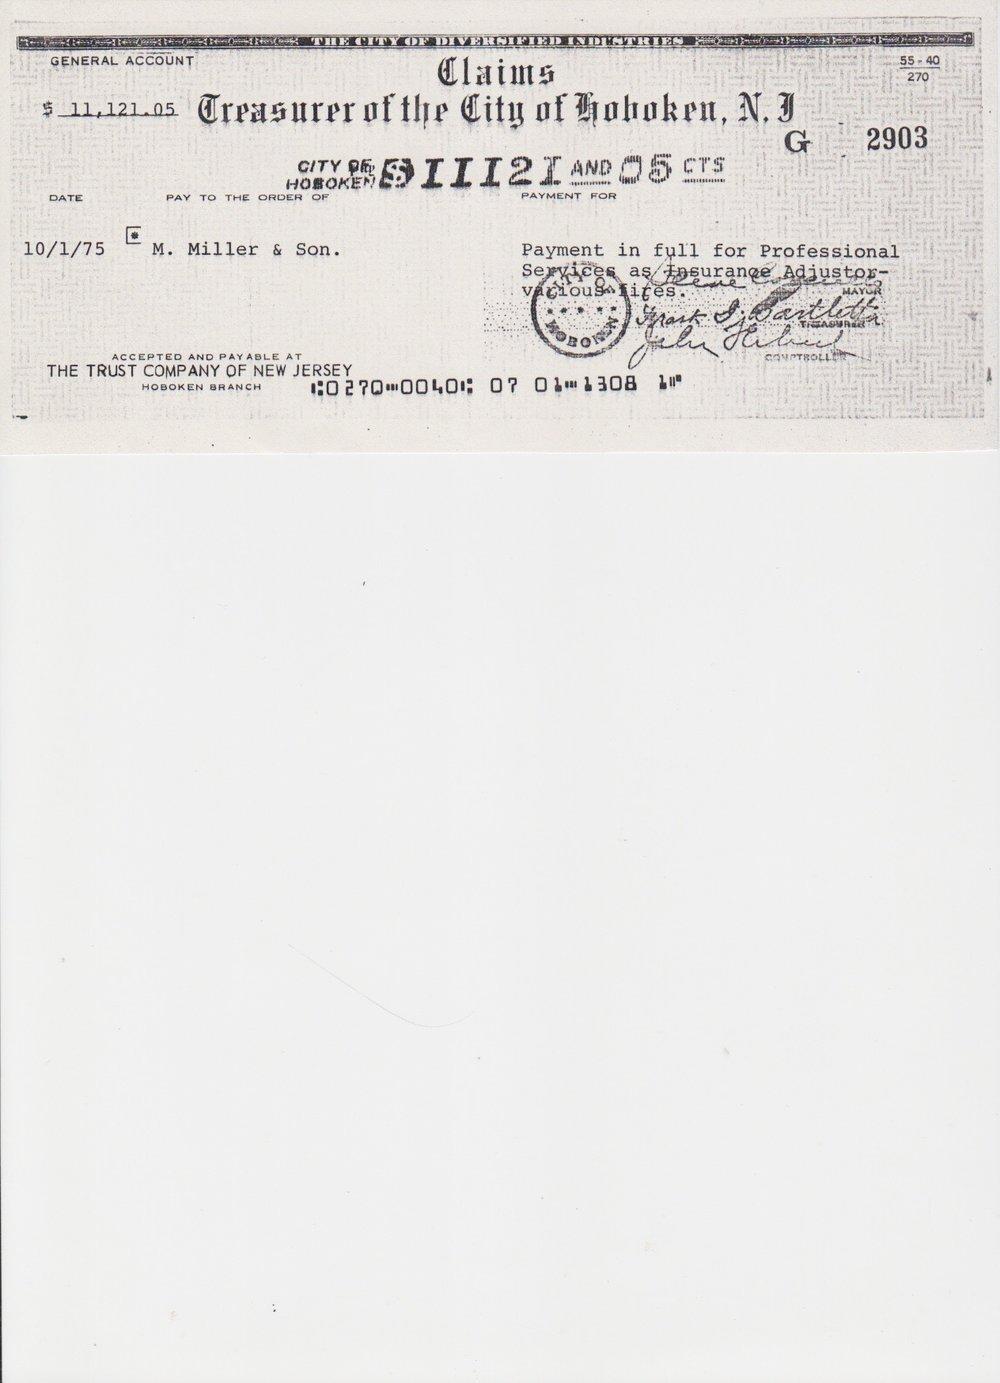 Claims Tix City of Hoboken 1975.jpeg